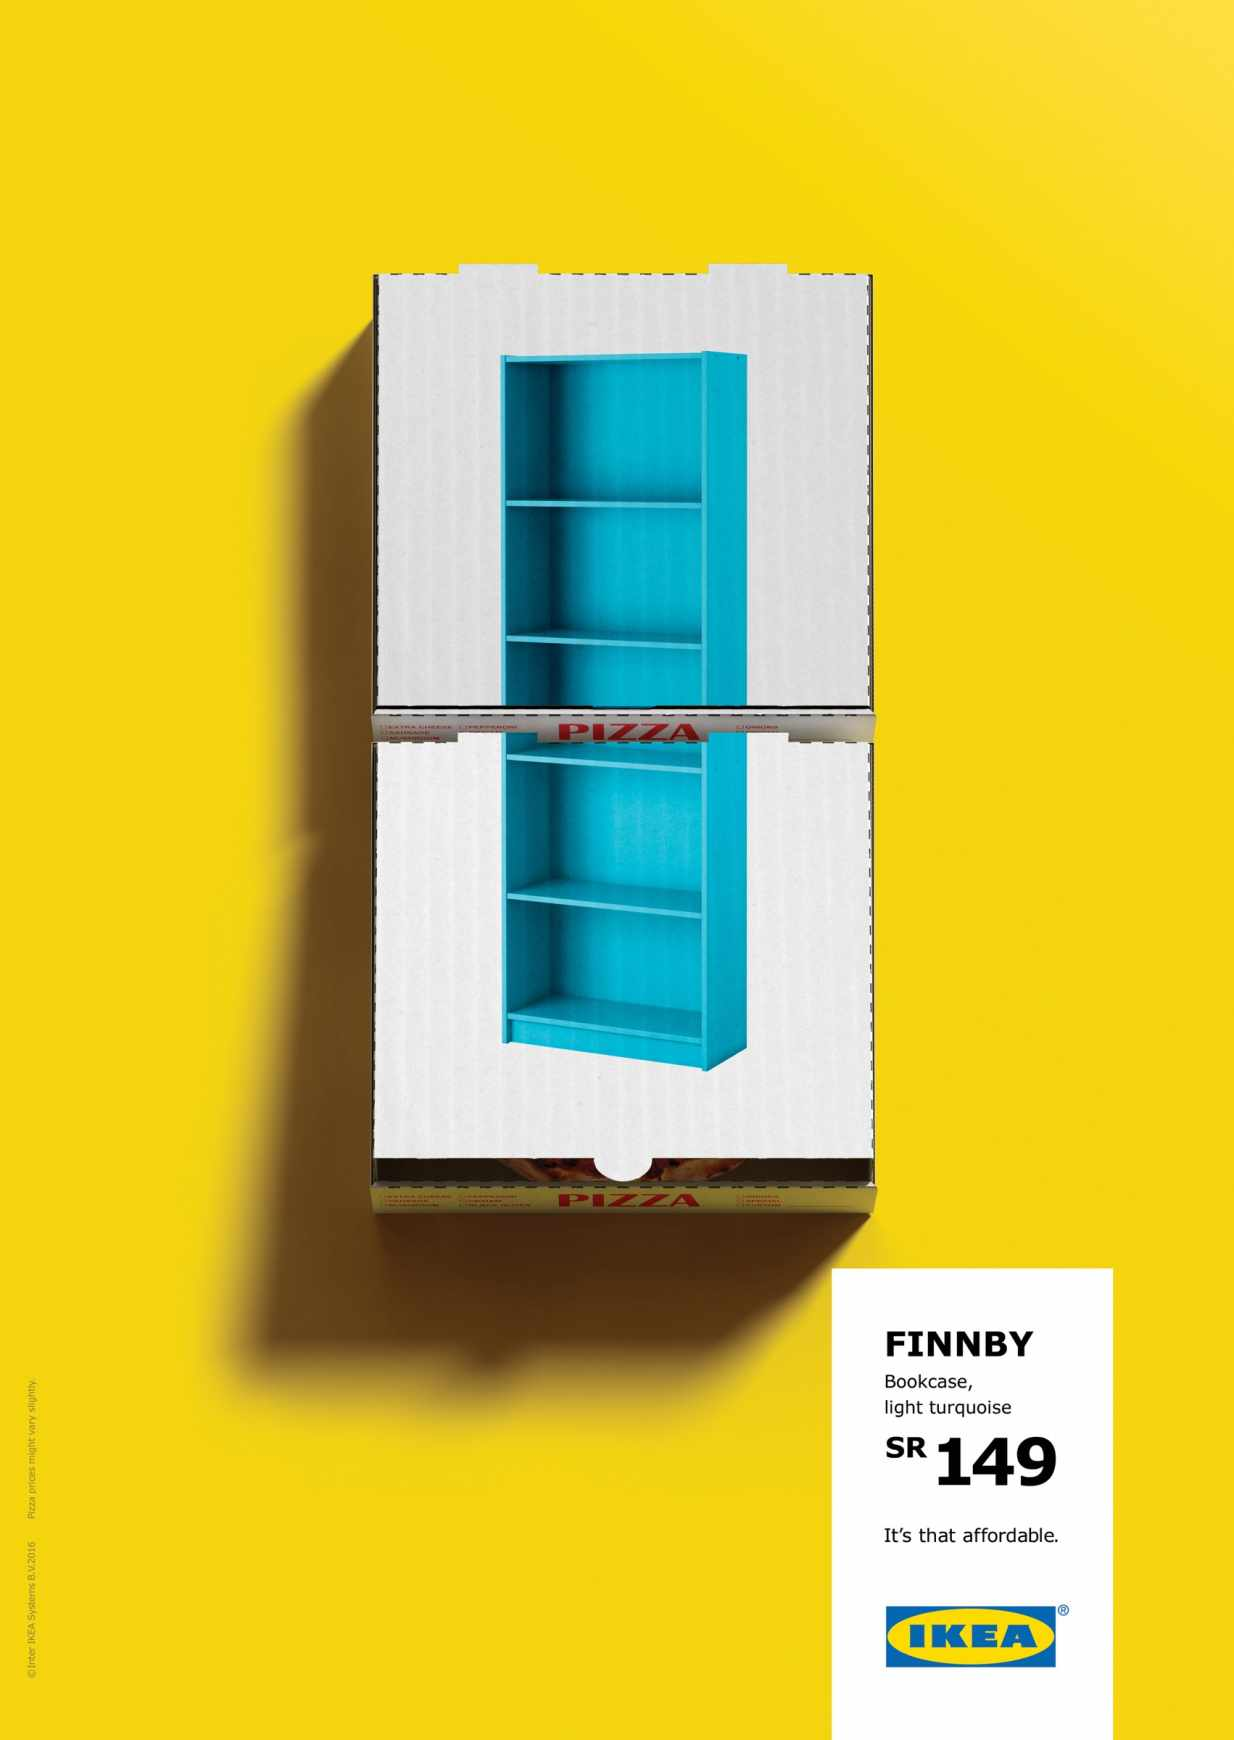 Superb IKEA ad campaign bookshelf